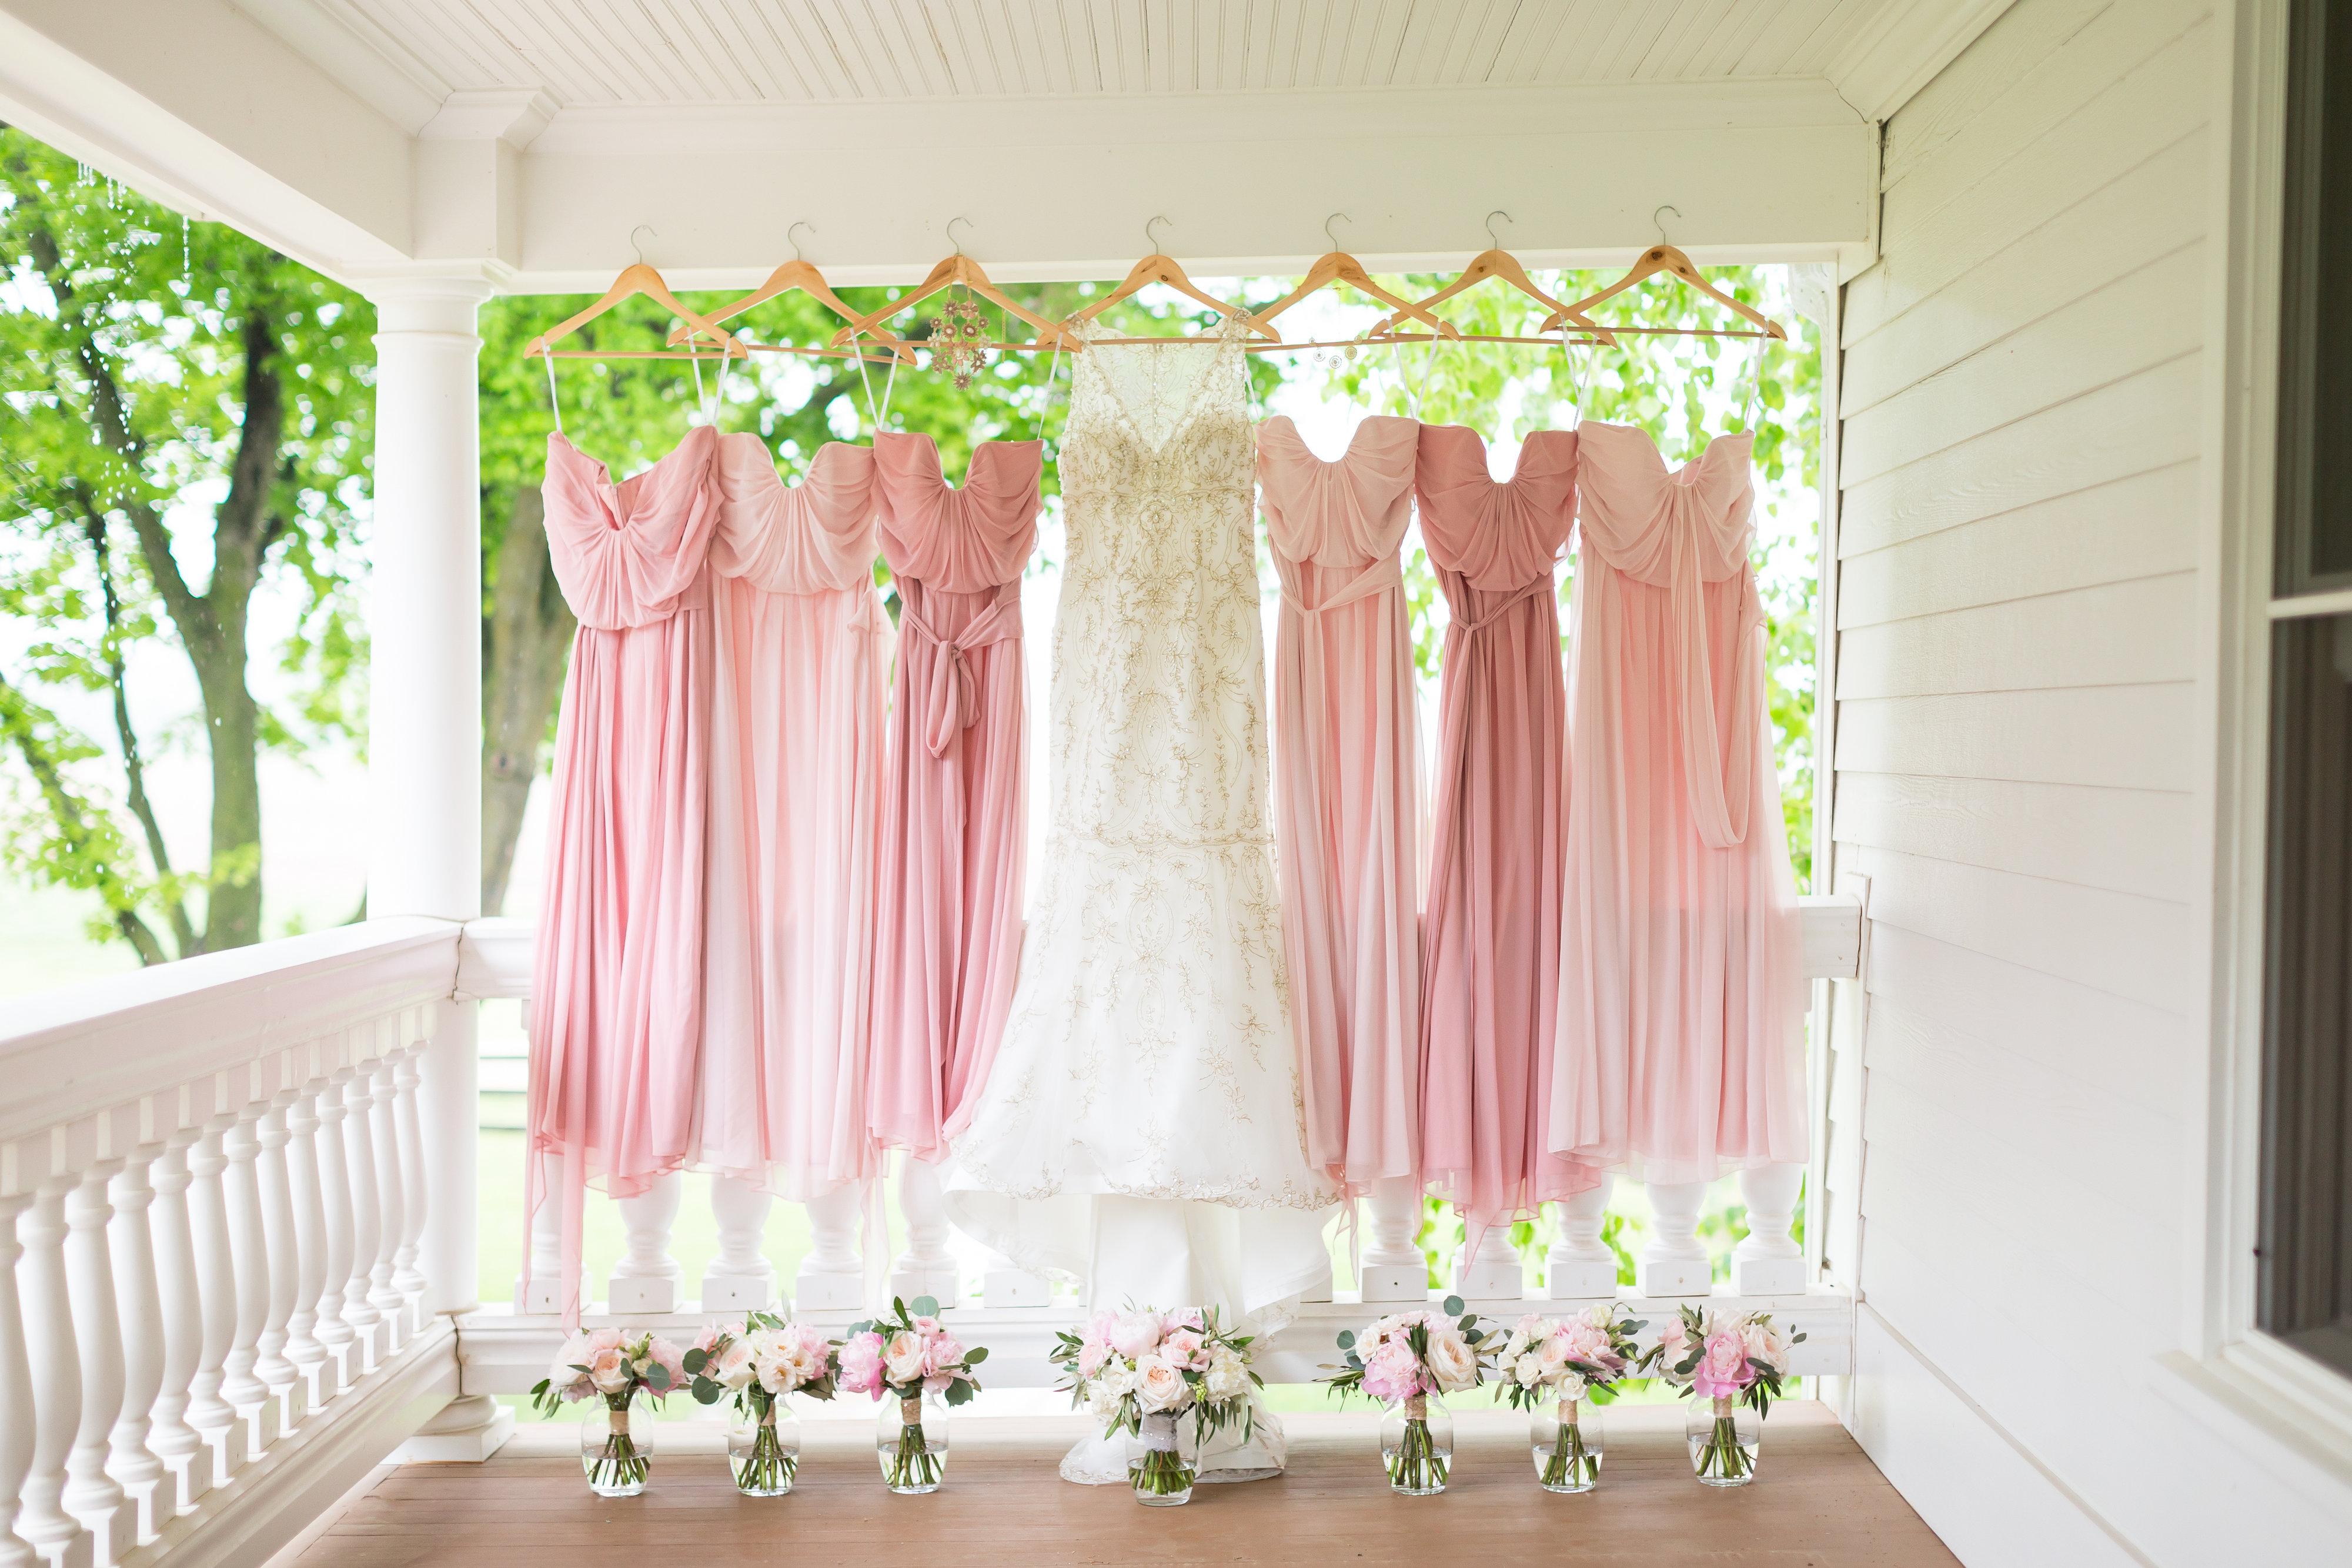 blush pink brides maids dresses with blush pink maids bouquets